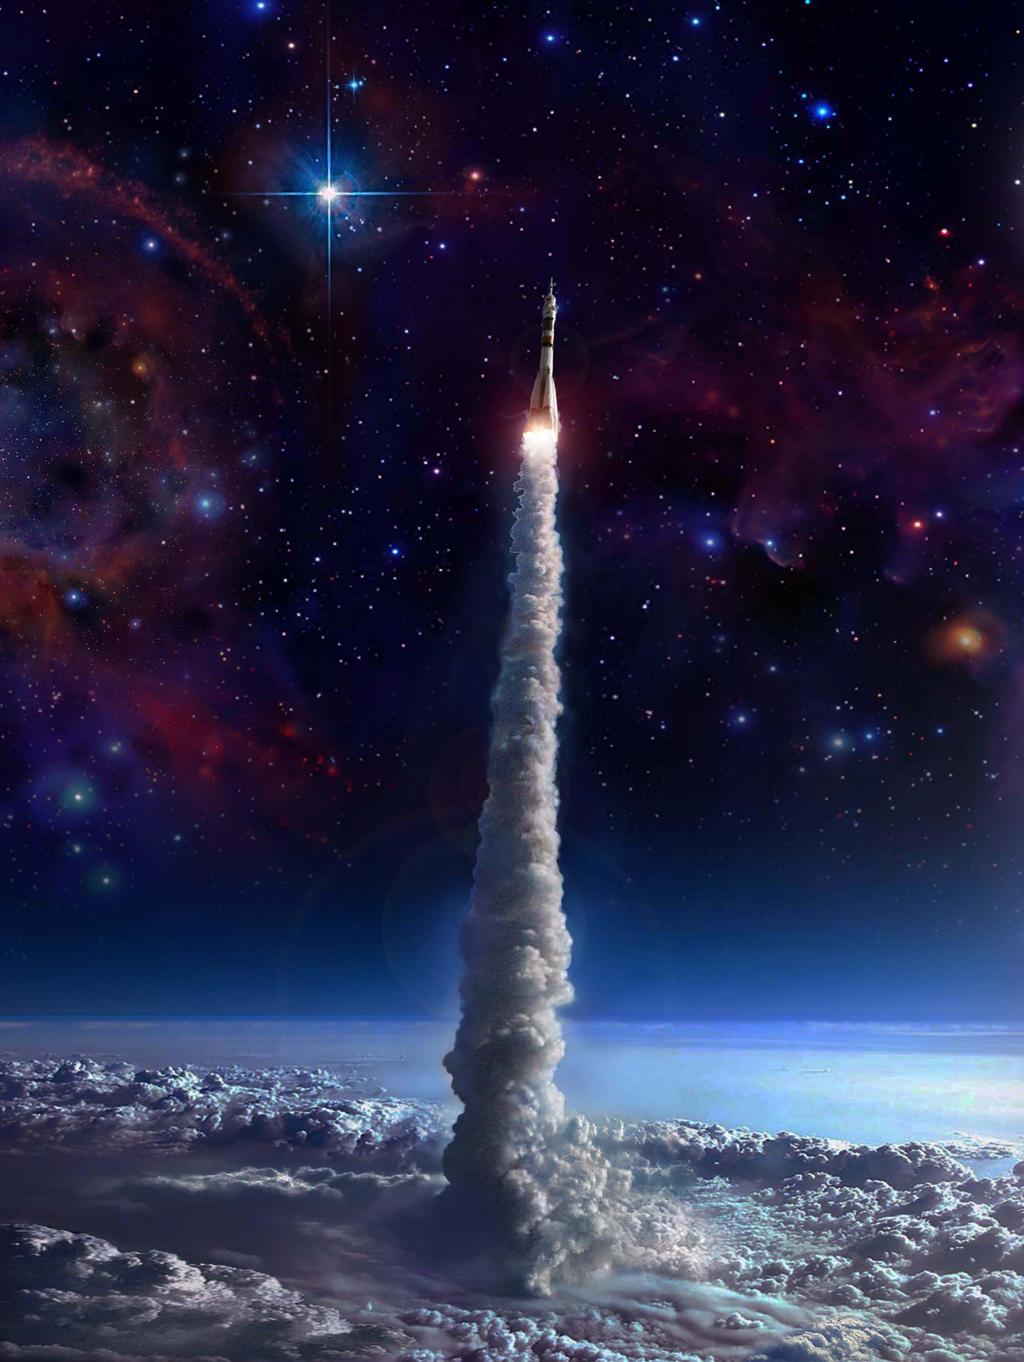 Sky Rocket by spoof-or-not-spoof on DeviantArt